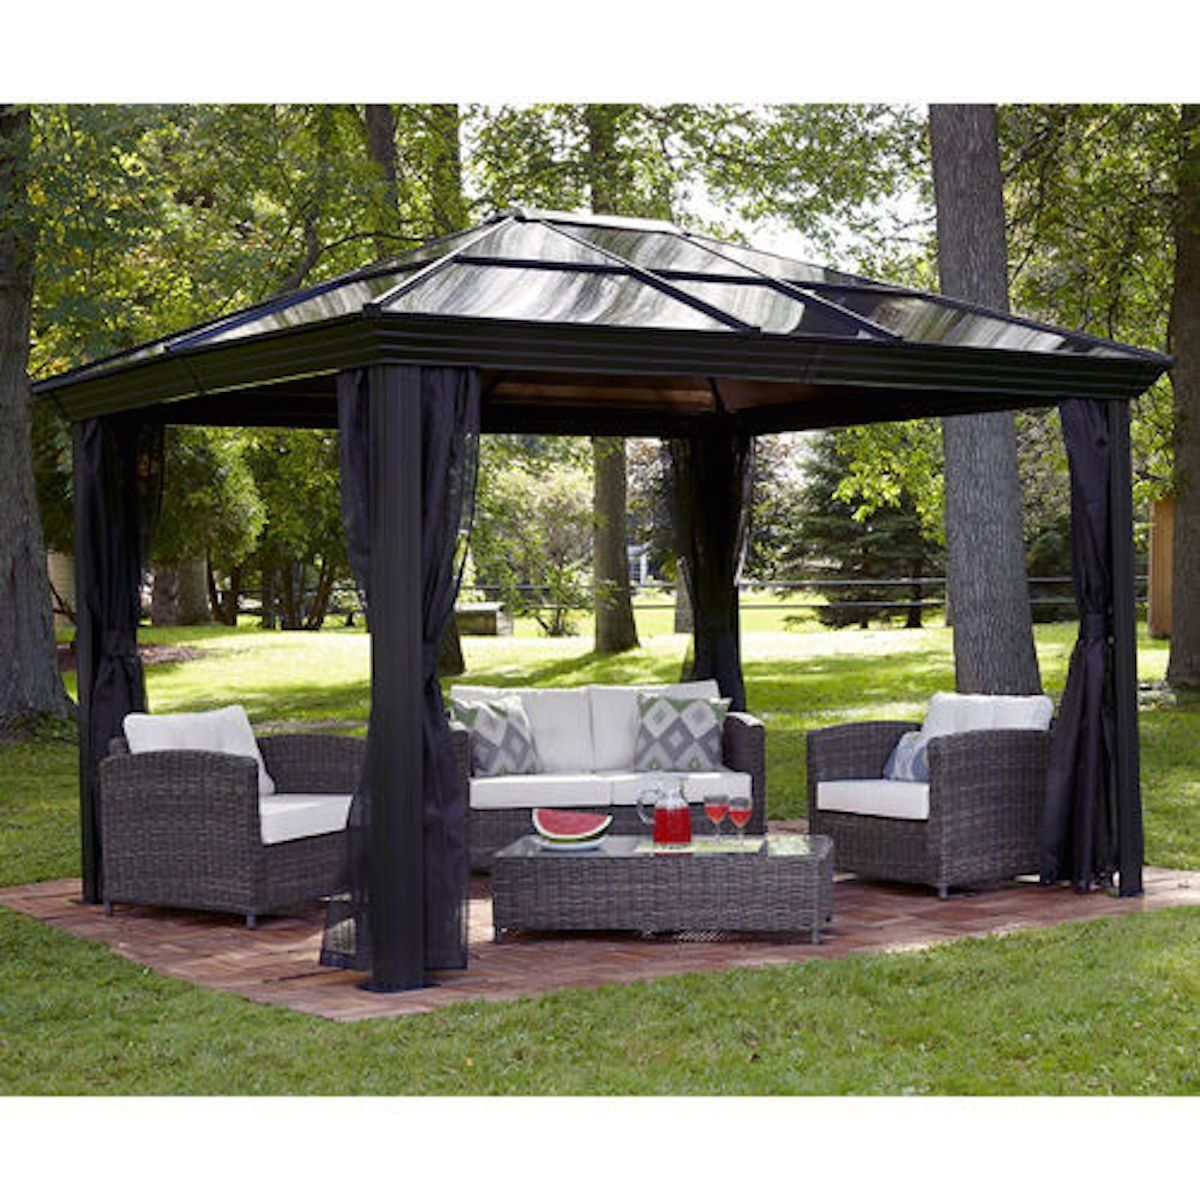 Gazebo Canopy. Pergola. This 10 x 12 Hardtop Gazebo Tent